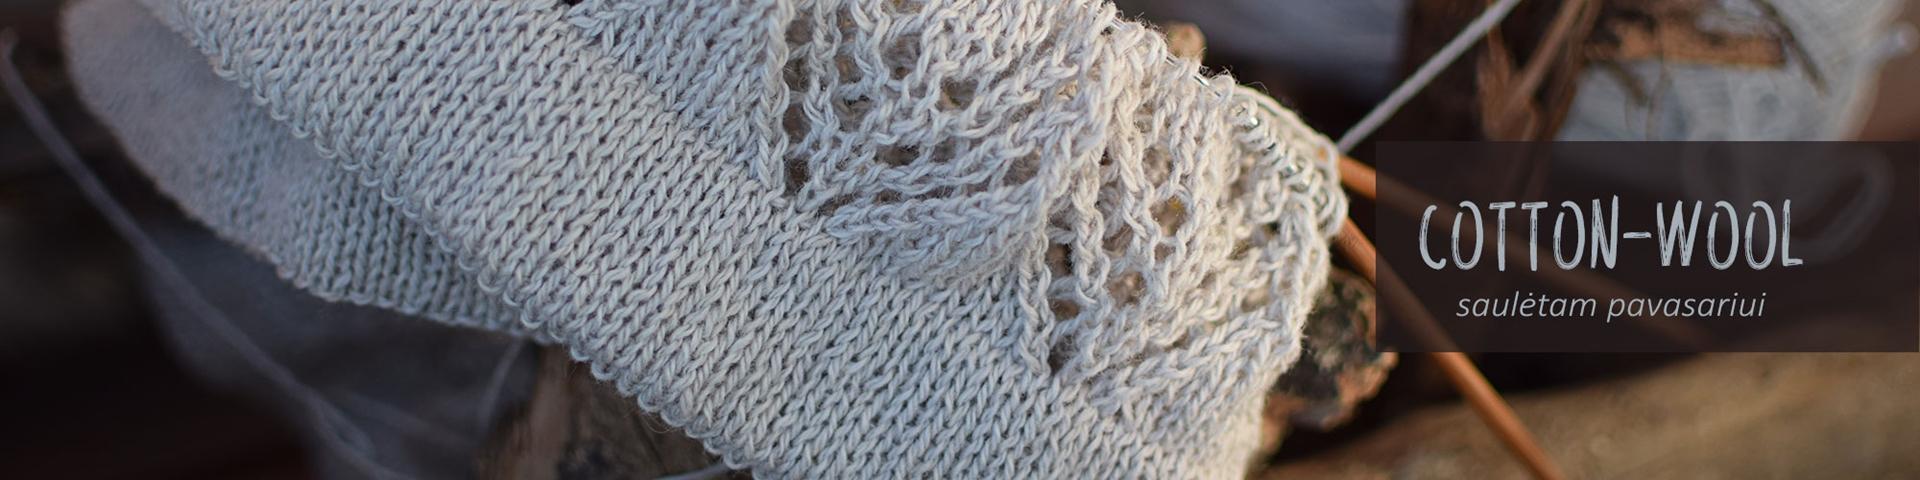 Cotton-Wool (55% merino ėriuko vilna, 45% medvilnė)